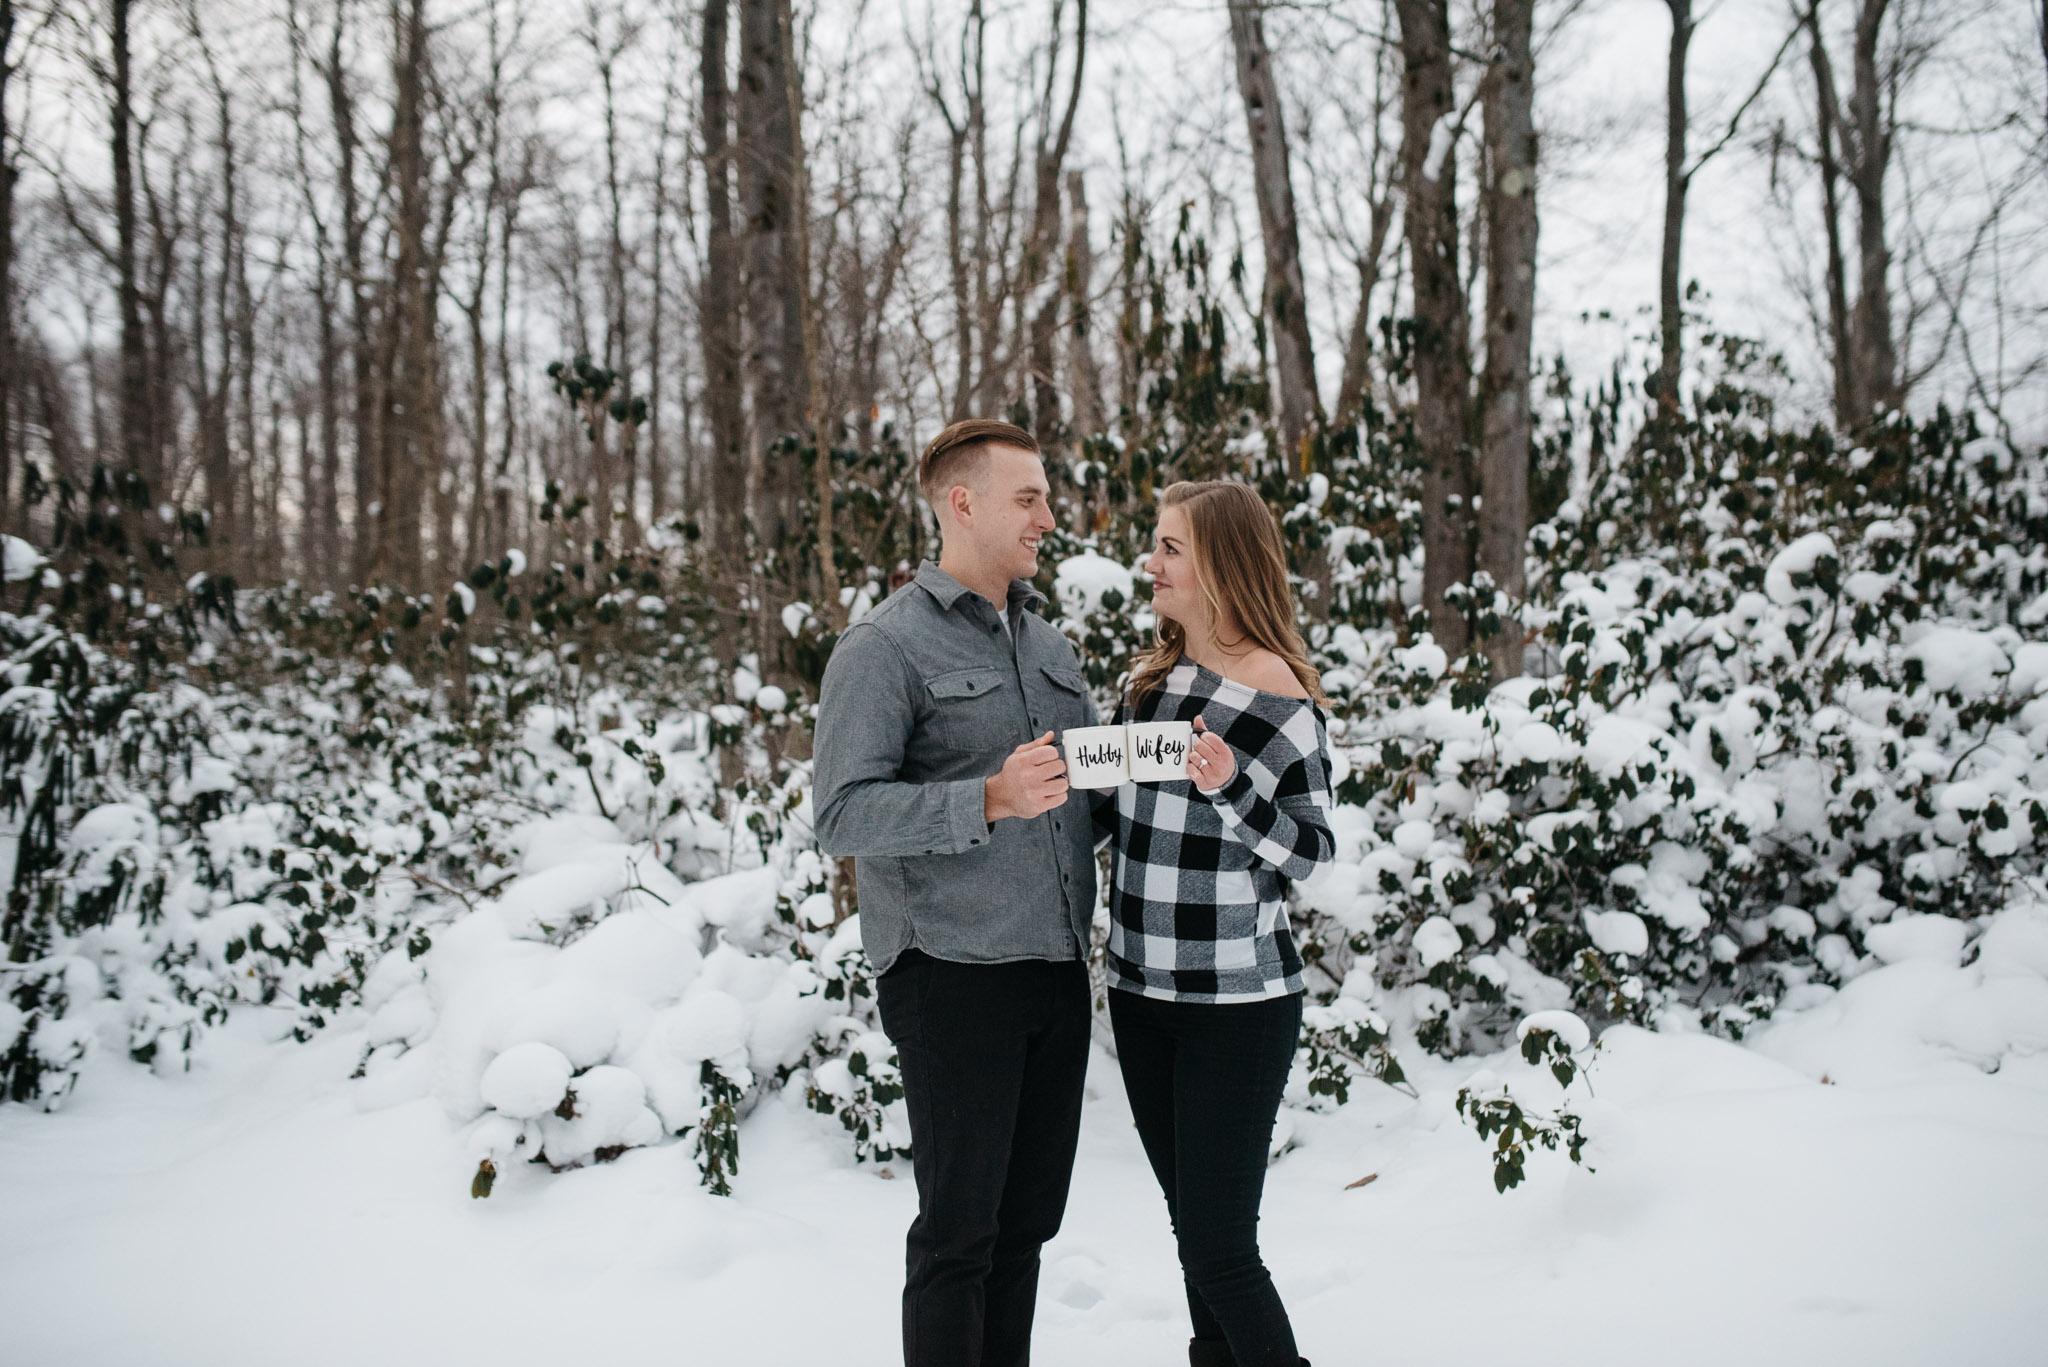 Ligonier-Linn-Run-Engagement-Session-Pittsburgh-Photographer-Mariah-Fisher-12.jpg